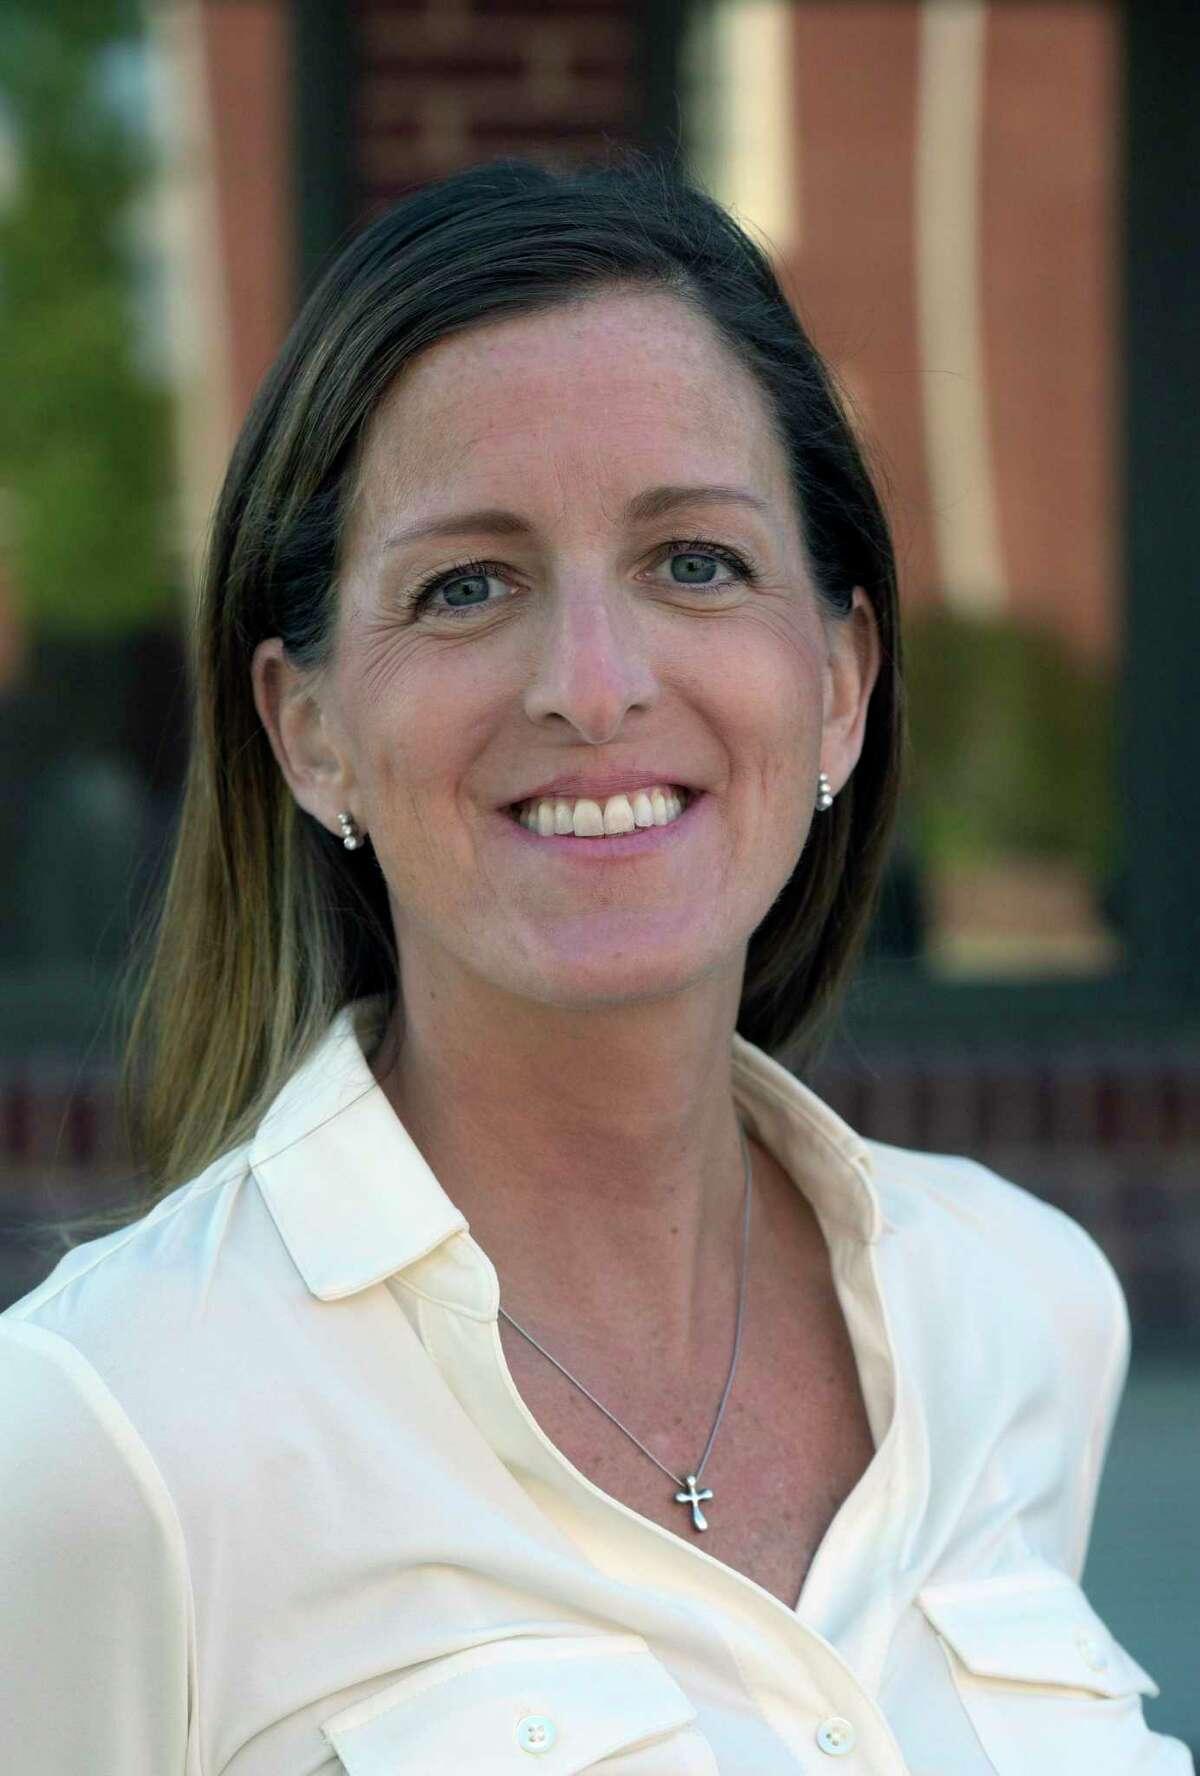 Republican Tara Carr, Republican, is running for first selectman in Brookfield. Friday, October 1, 2021, Danbury, Conn.